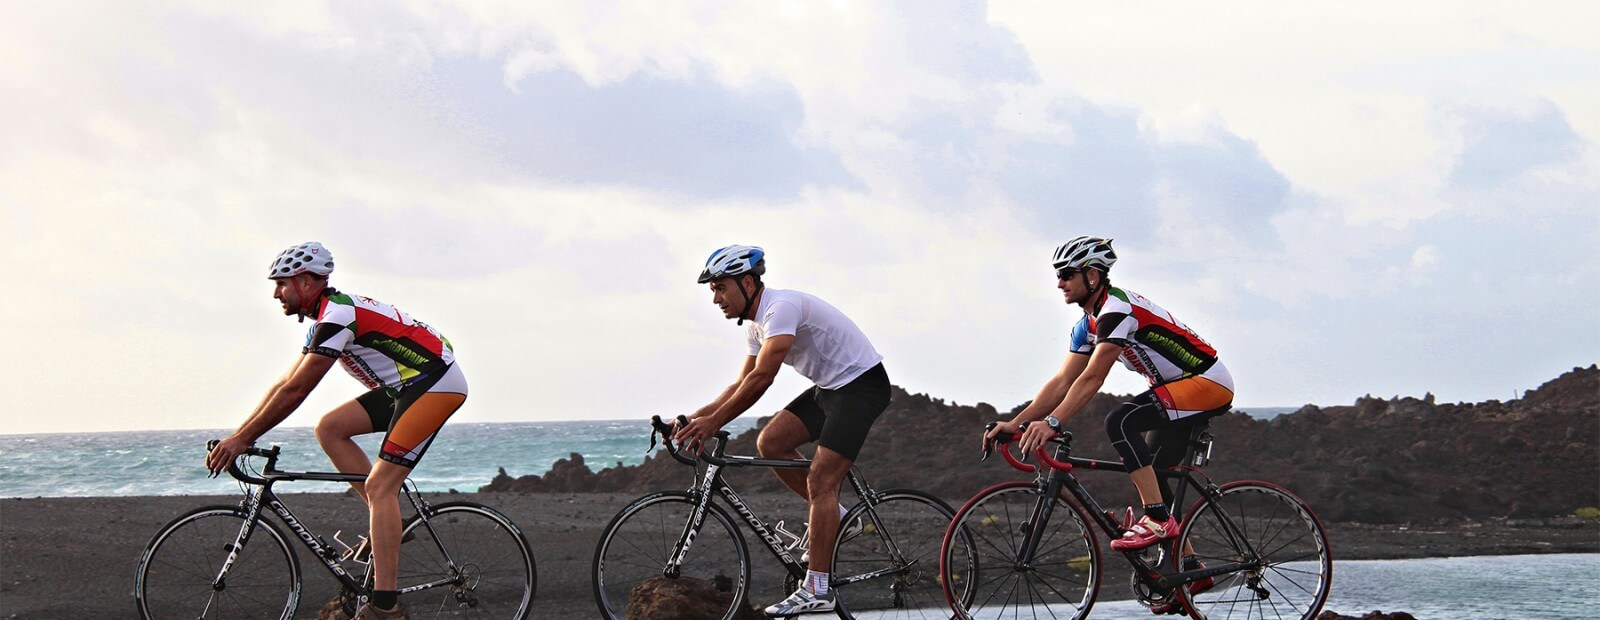 Discover Lanzarote